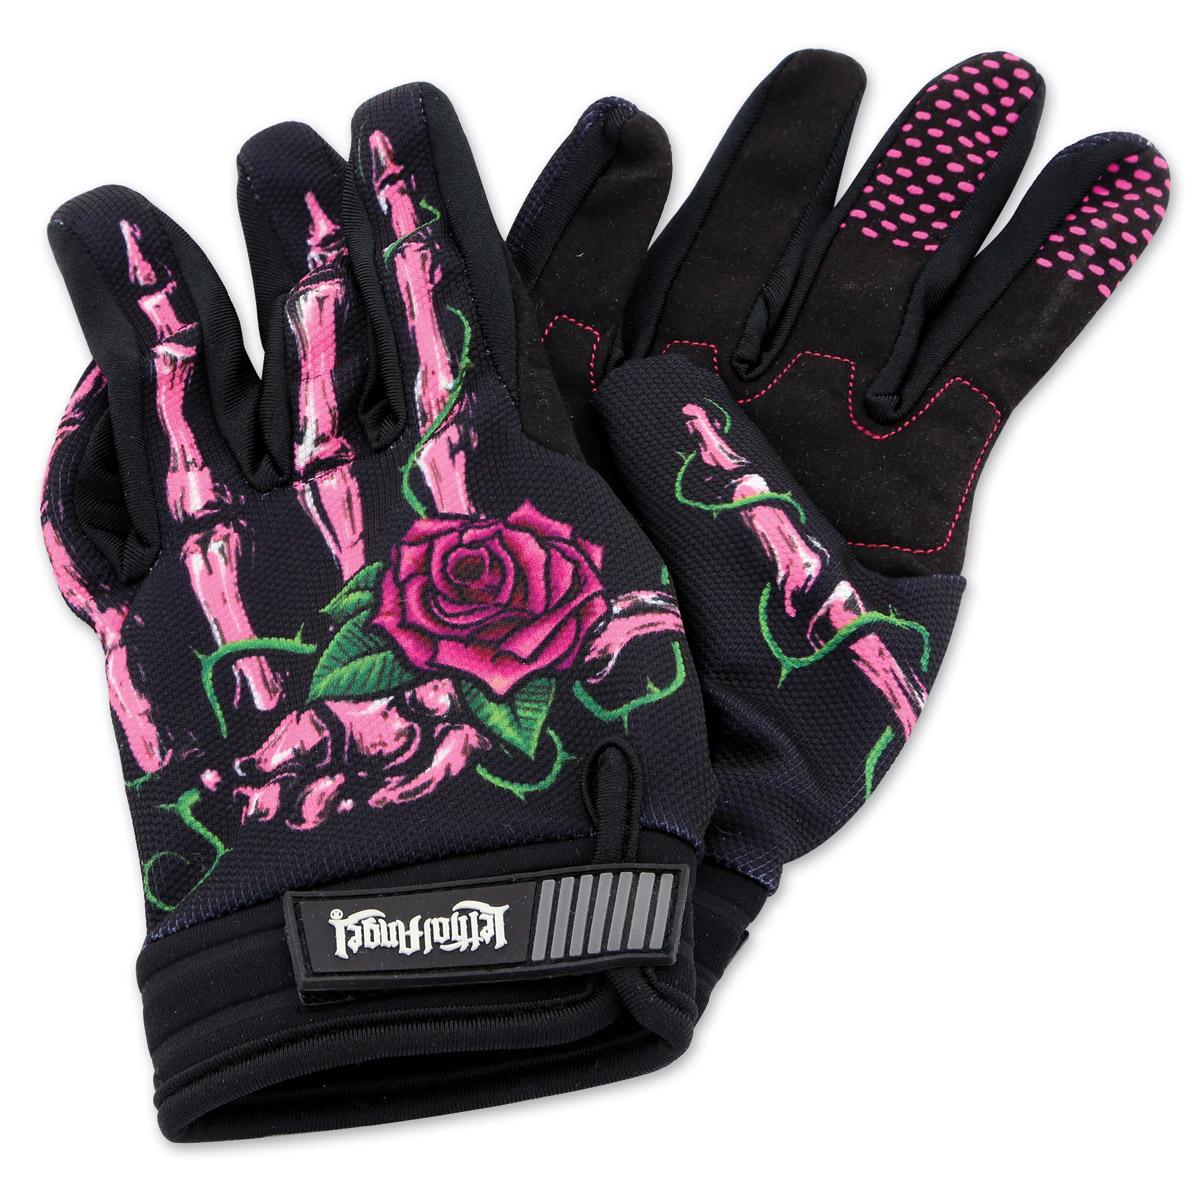 Lethal Threat Women s Pink Rose Black Garage Gloves - GL15002XL ... 85c51eee37